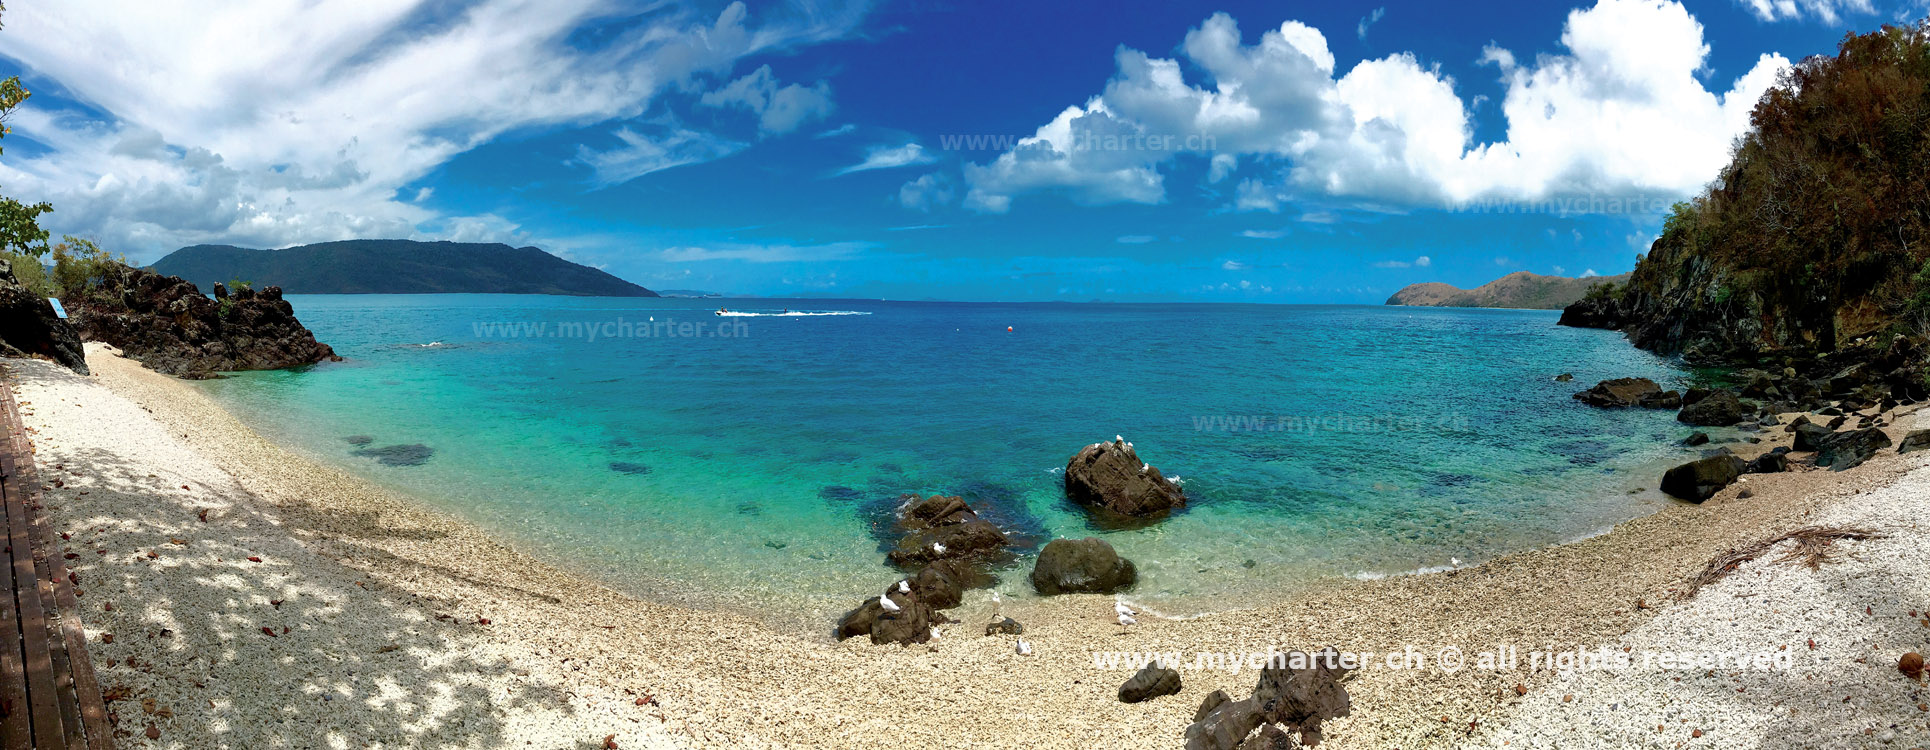 Yachtcharter Australien - Daydream Island